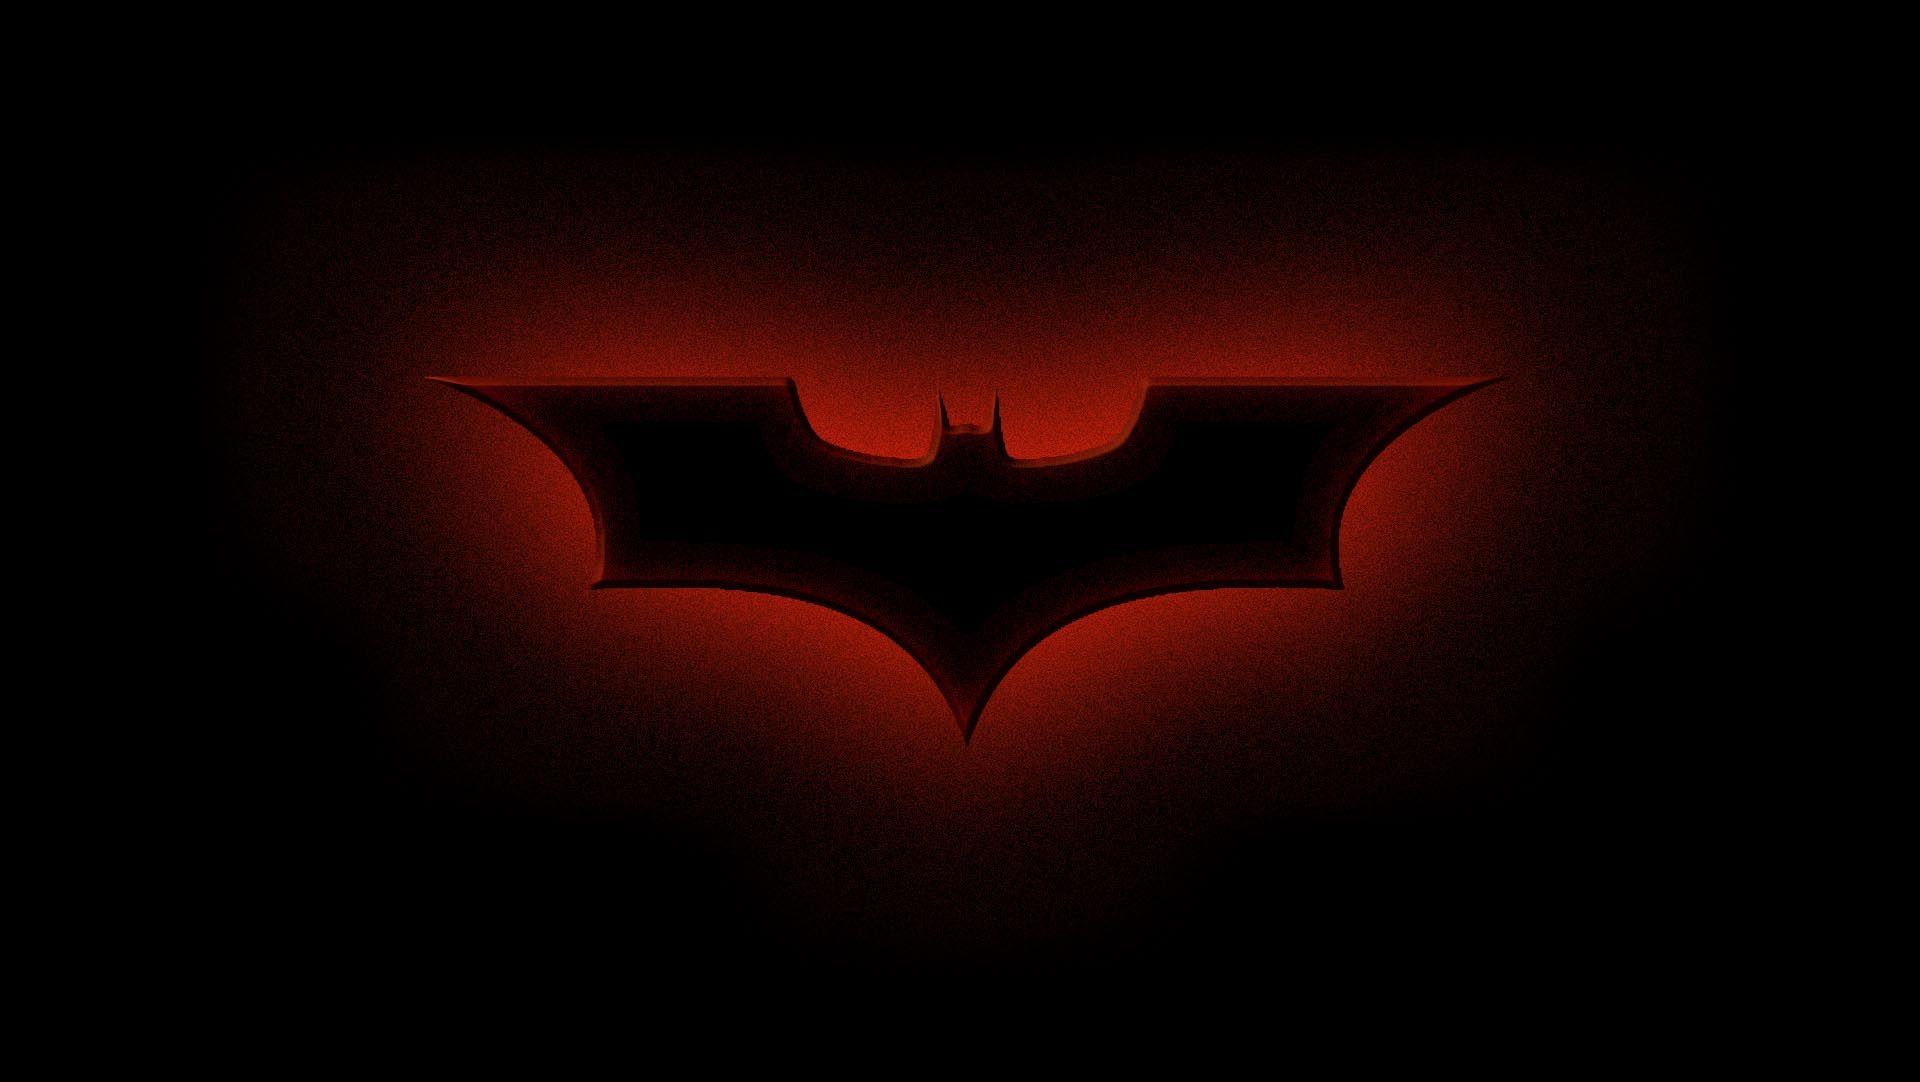 Dark Knight Logo In A Red Glow Knight Logo Dark Knight Pop Art